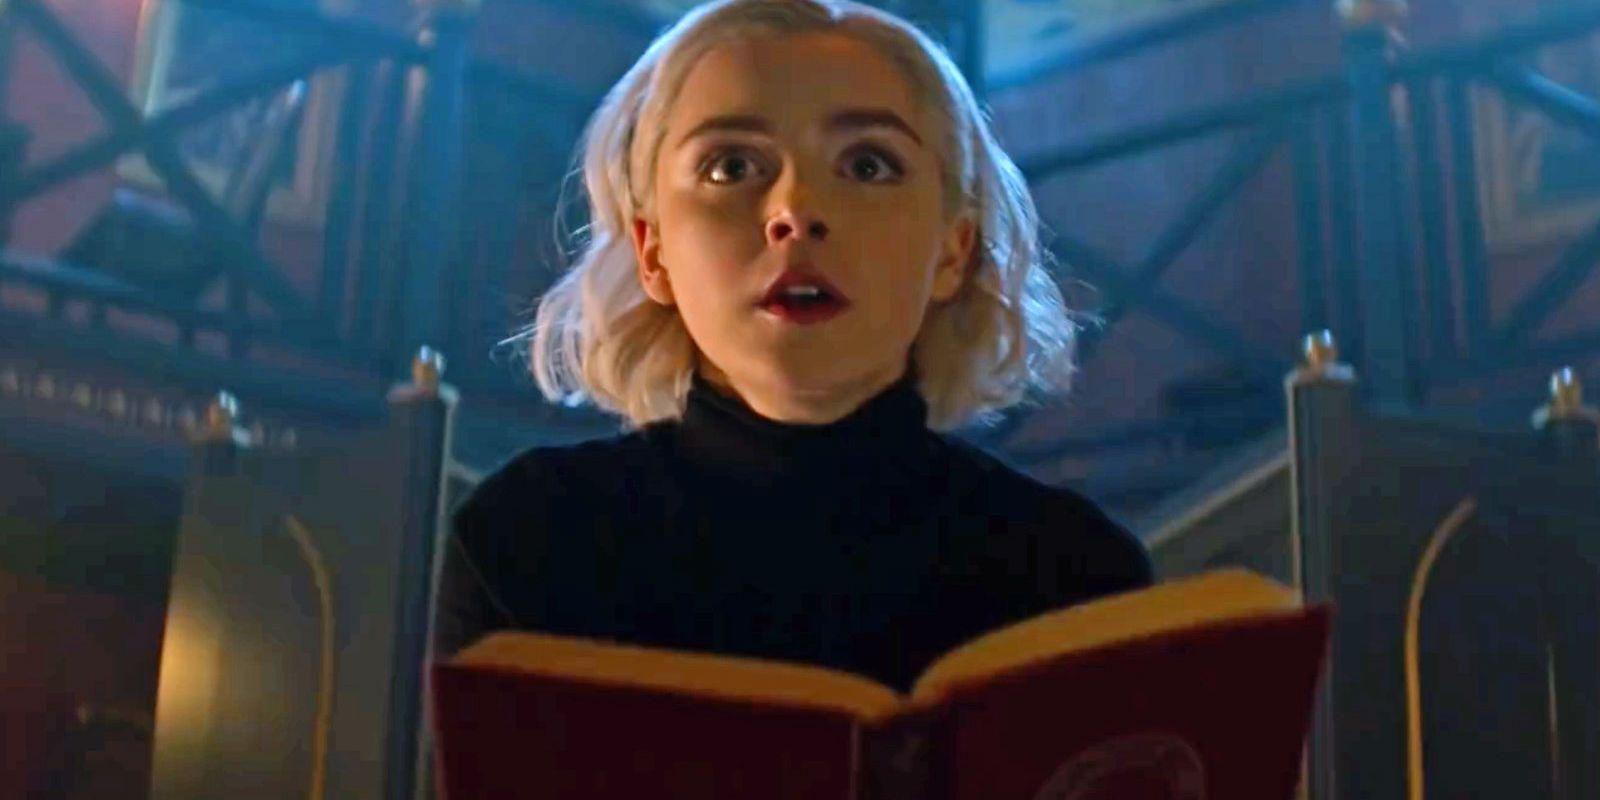 Netflix Renews Chilling Adventures of Sabrina For Seasons 3 & 4